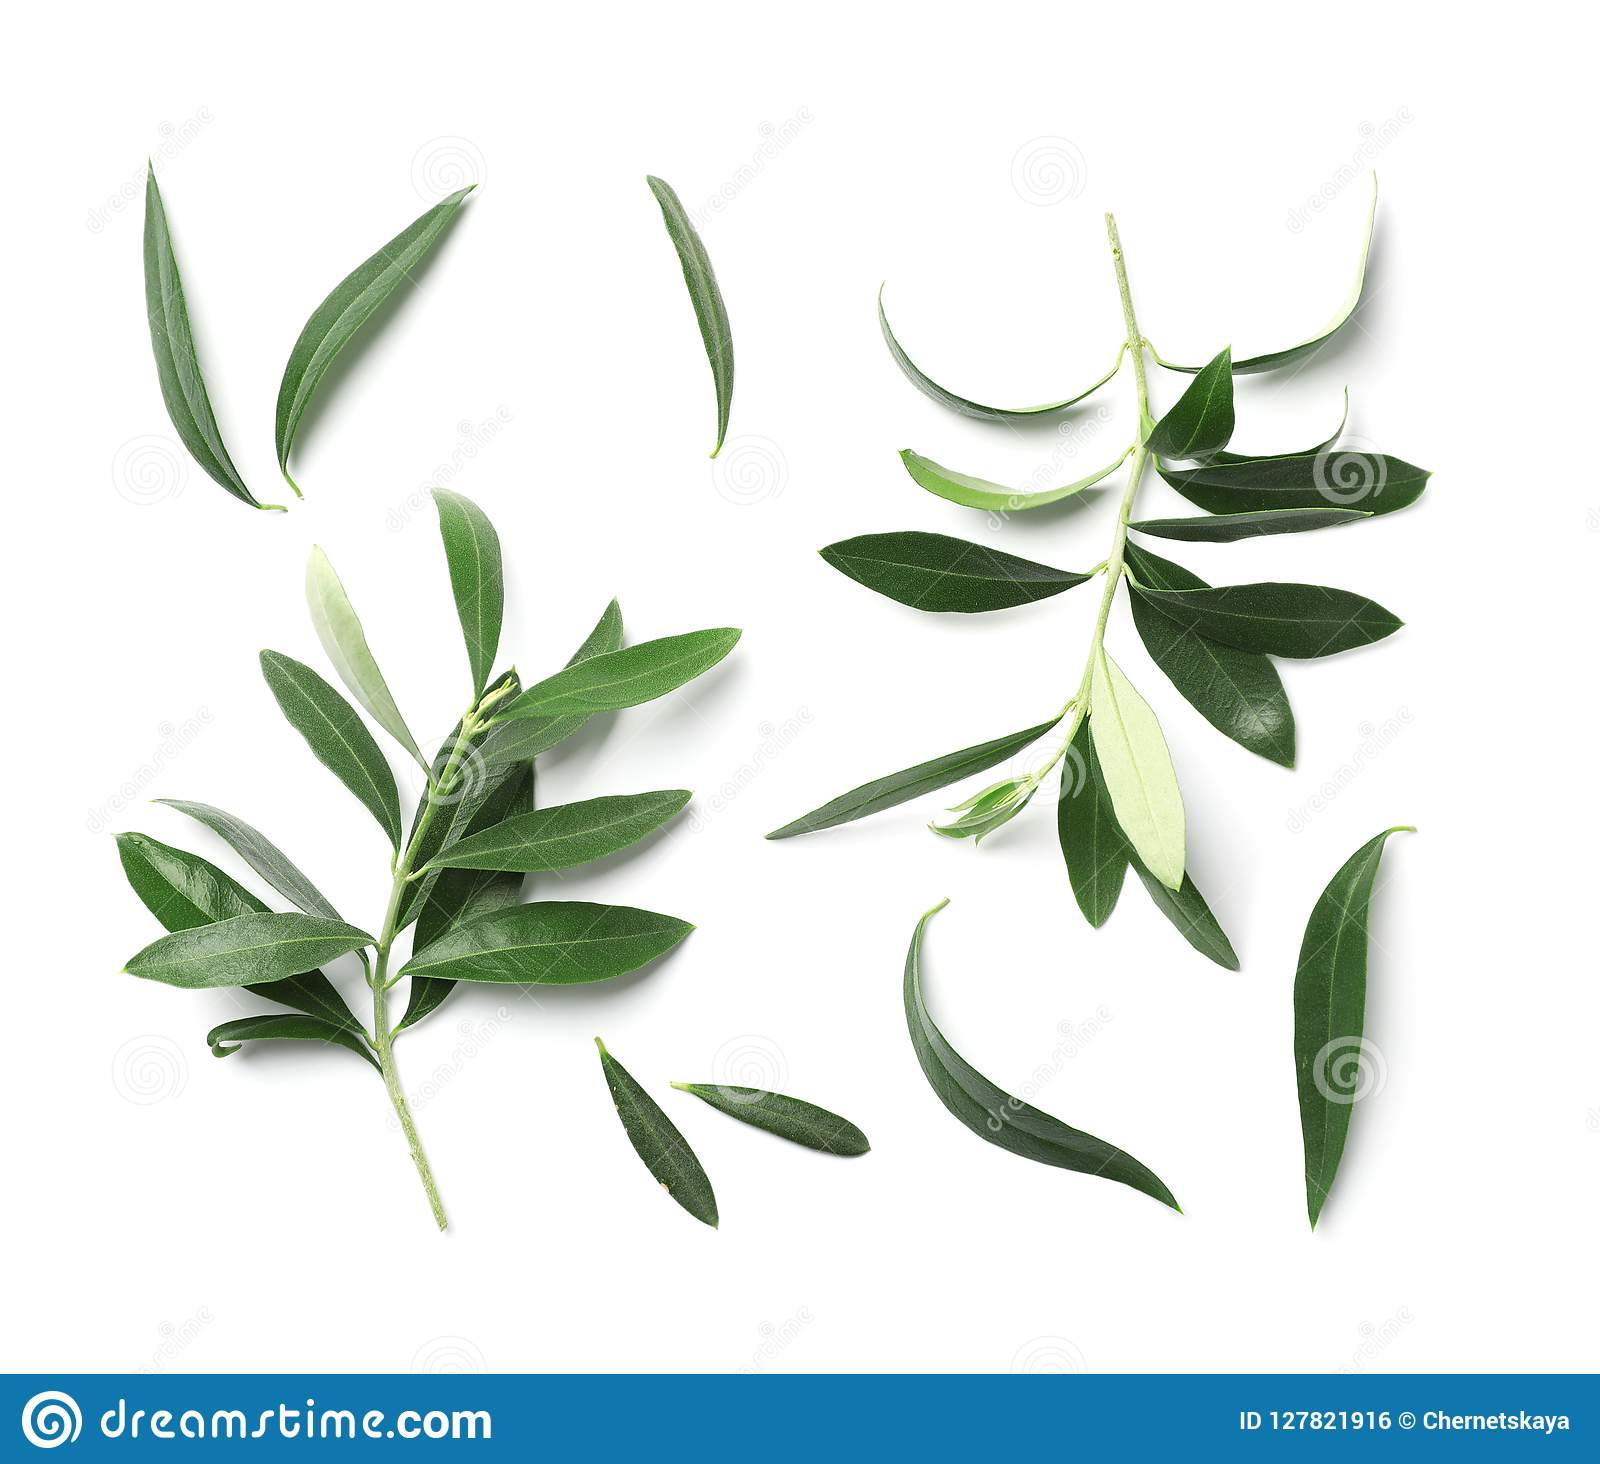 Samenstelling met verse groene olijfbladeren en takjes op witte achtergrond